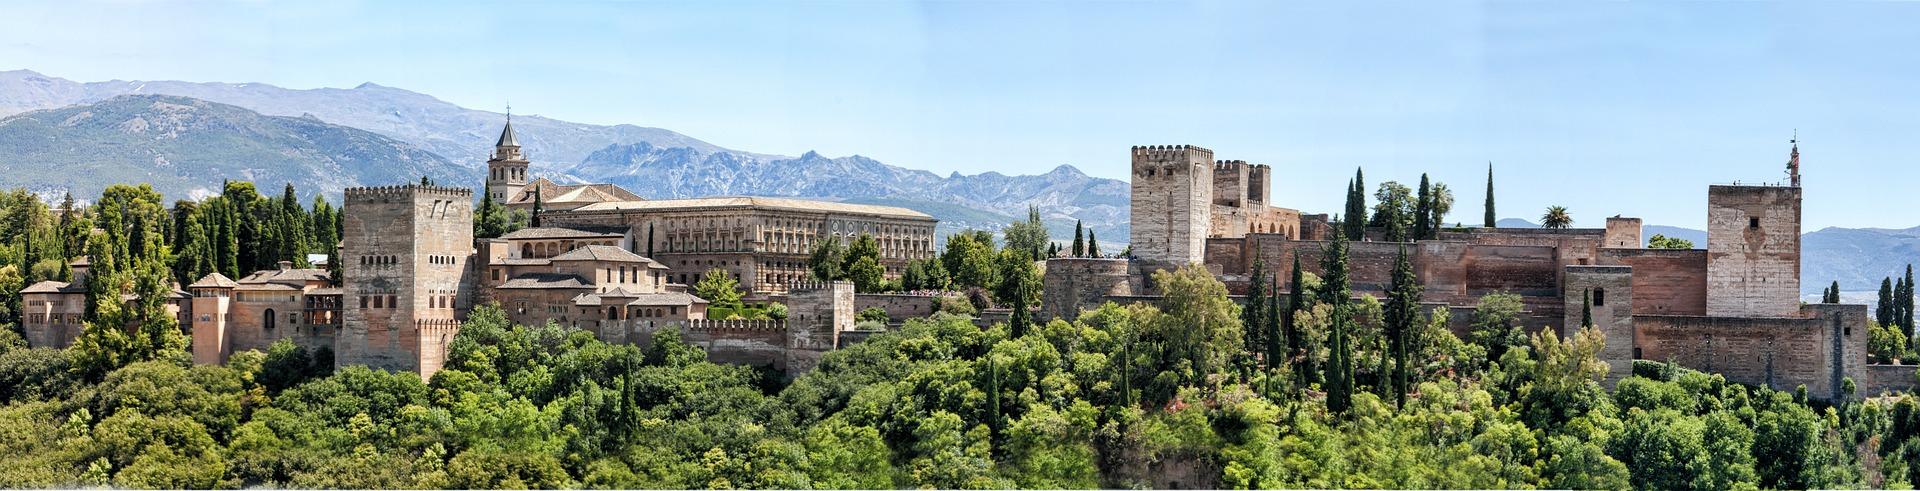 The Alhambra, Granada, Spain. Photo by ddouk on Pixabay.